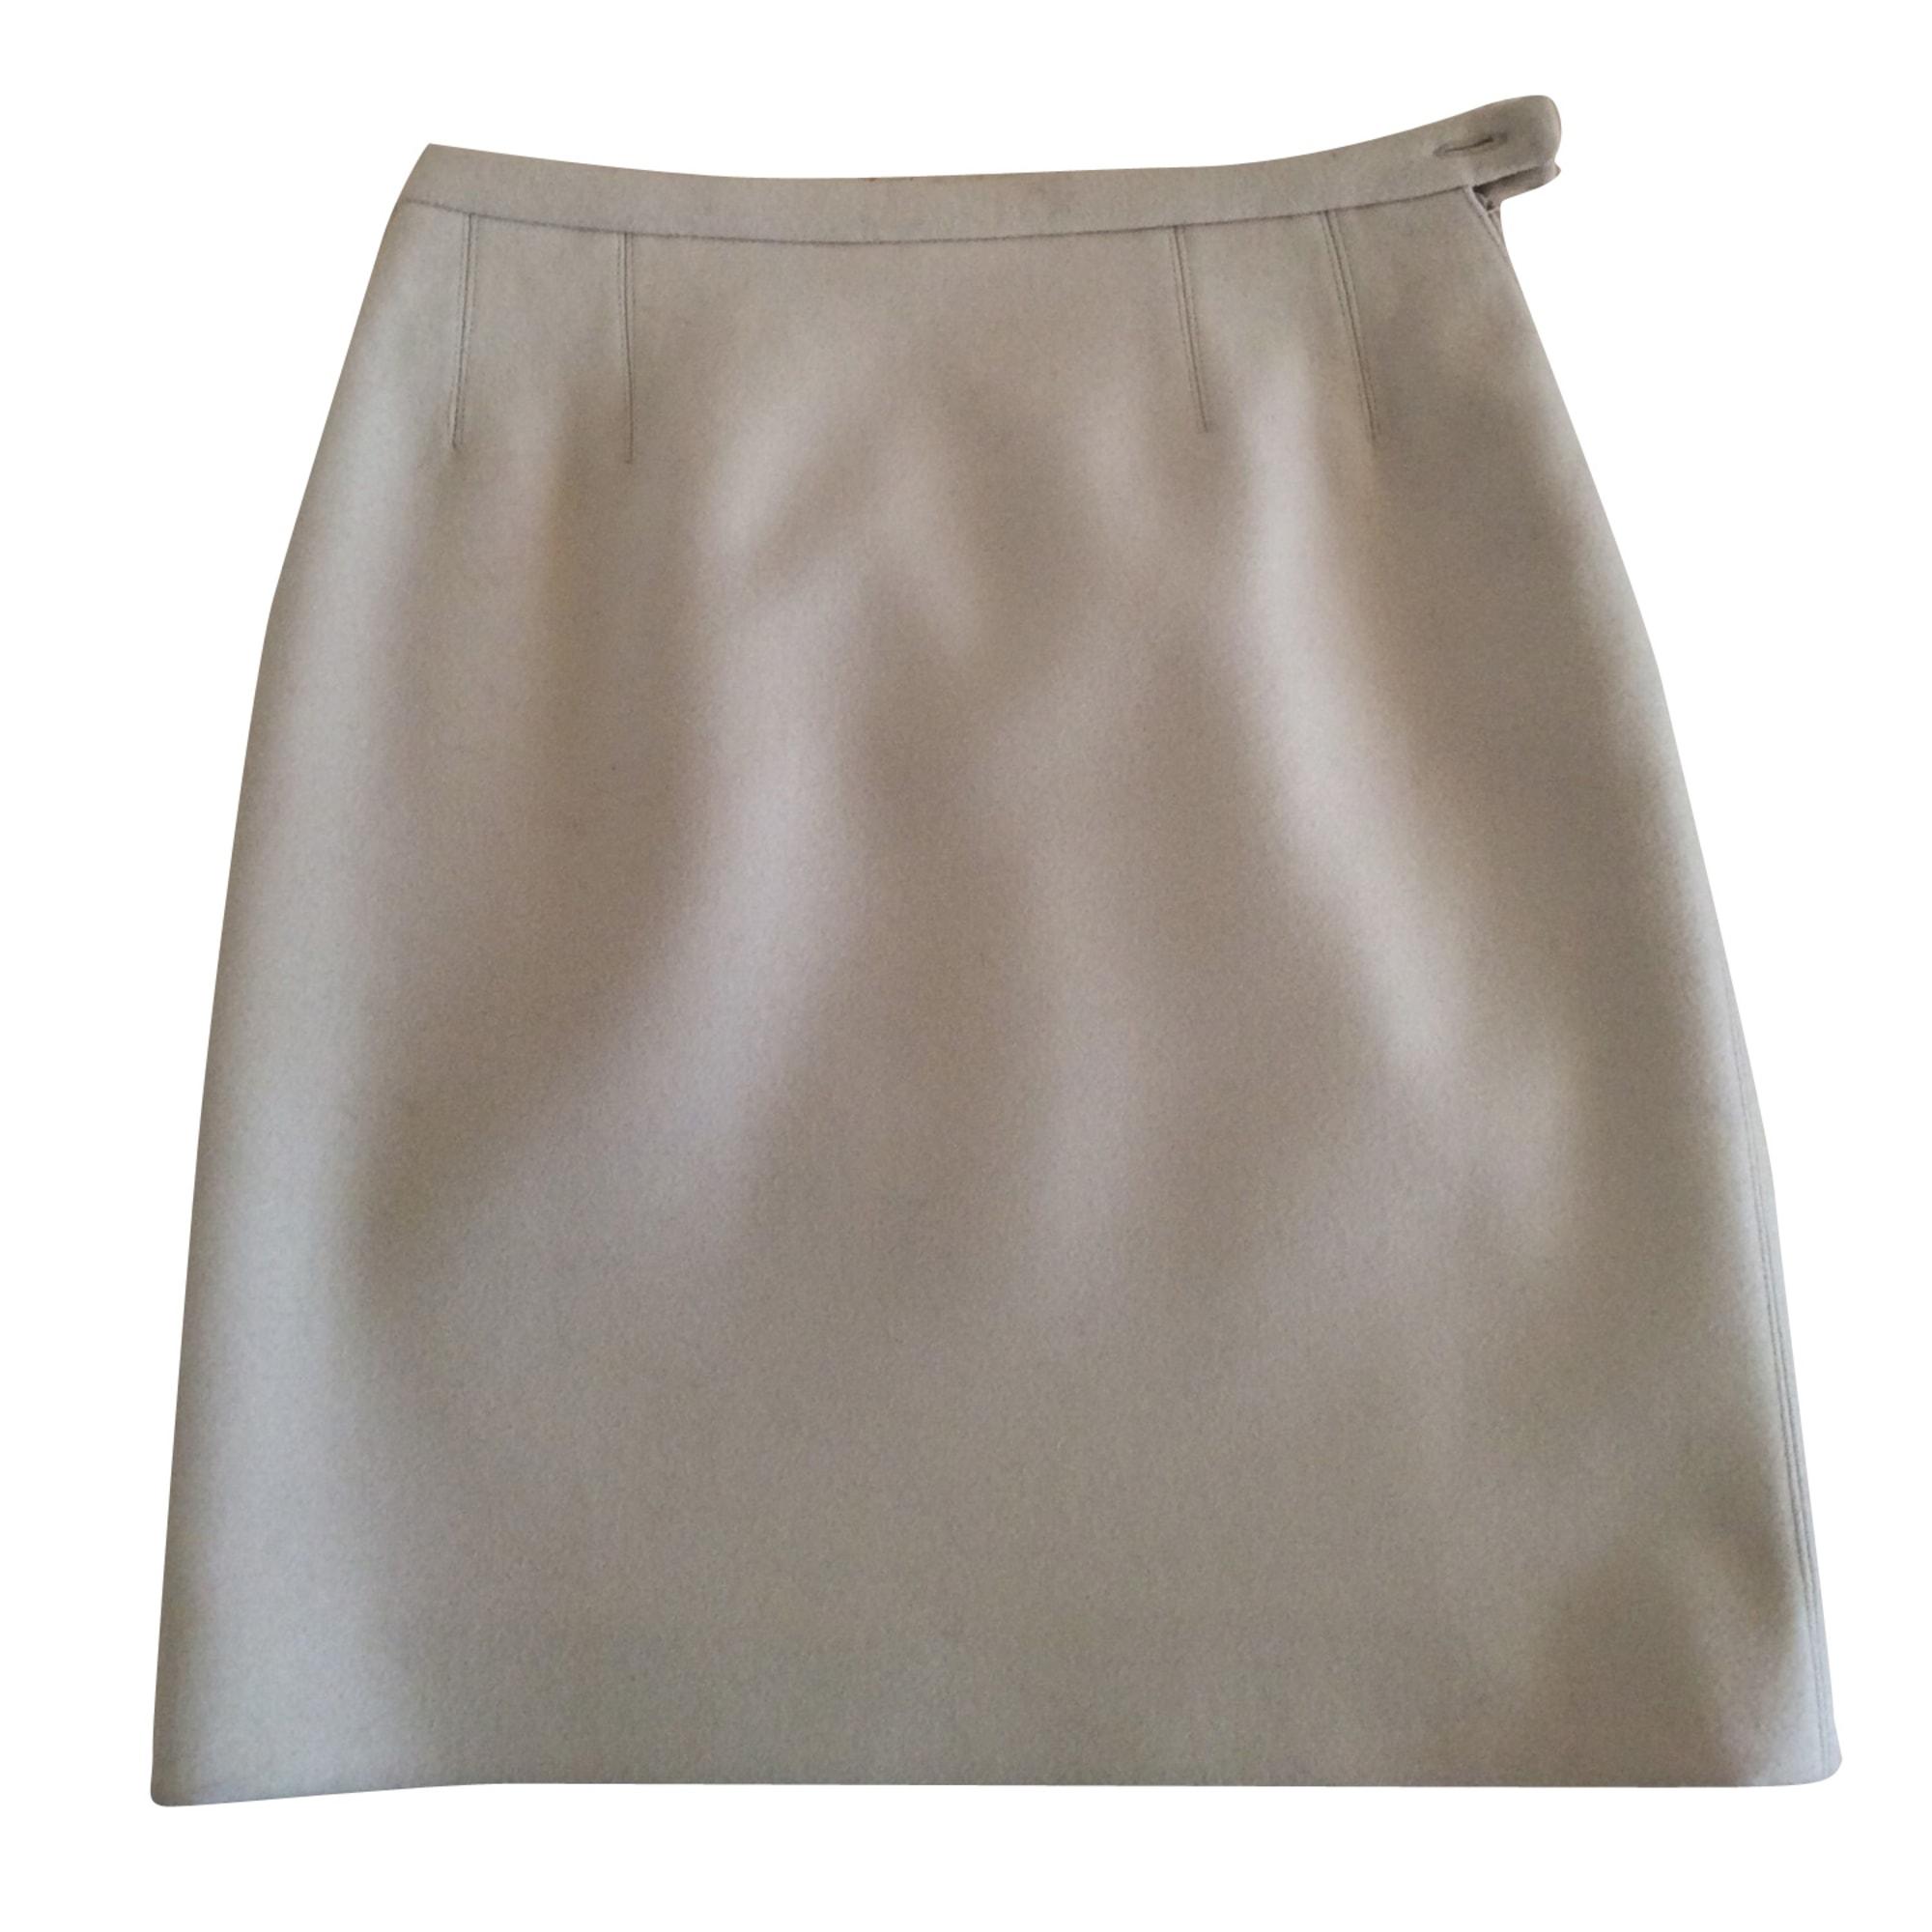 Jupe courte MAX MARA Blanc, blanc cassé, écru